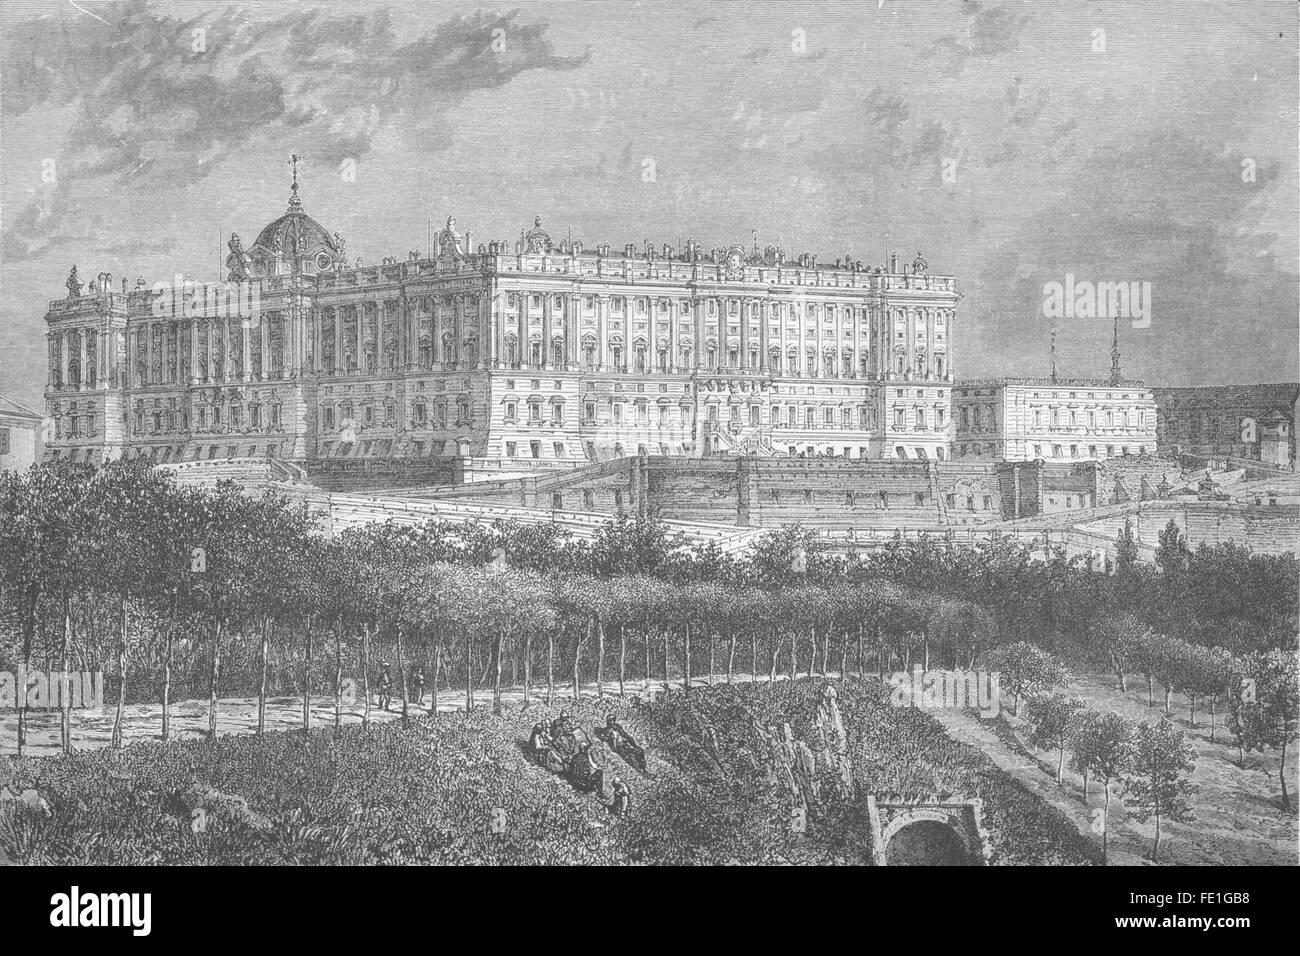 SPAIN: The Palacio real of Madrid, antique print 1881 Stock Photo